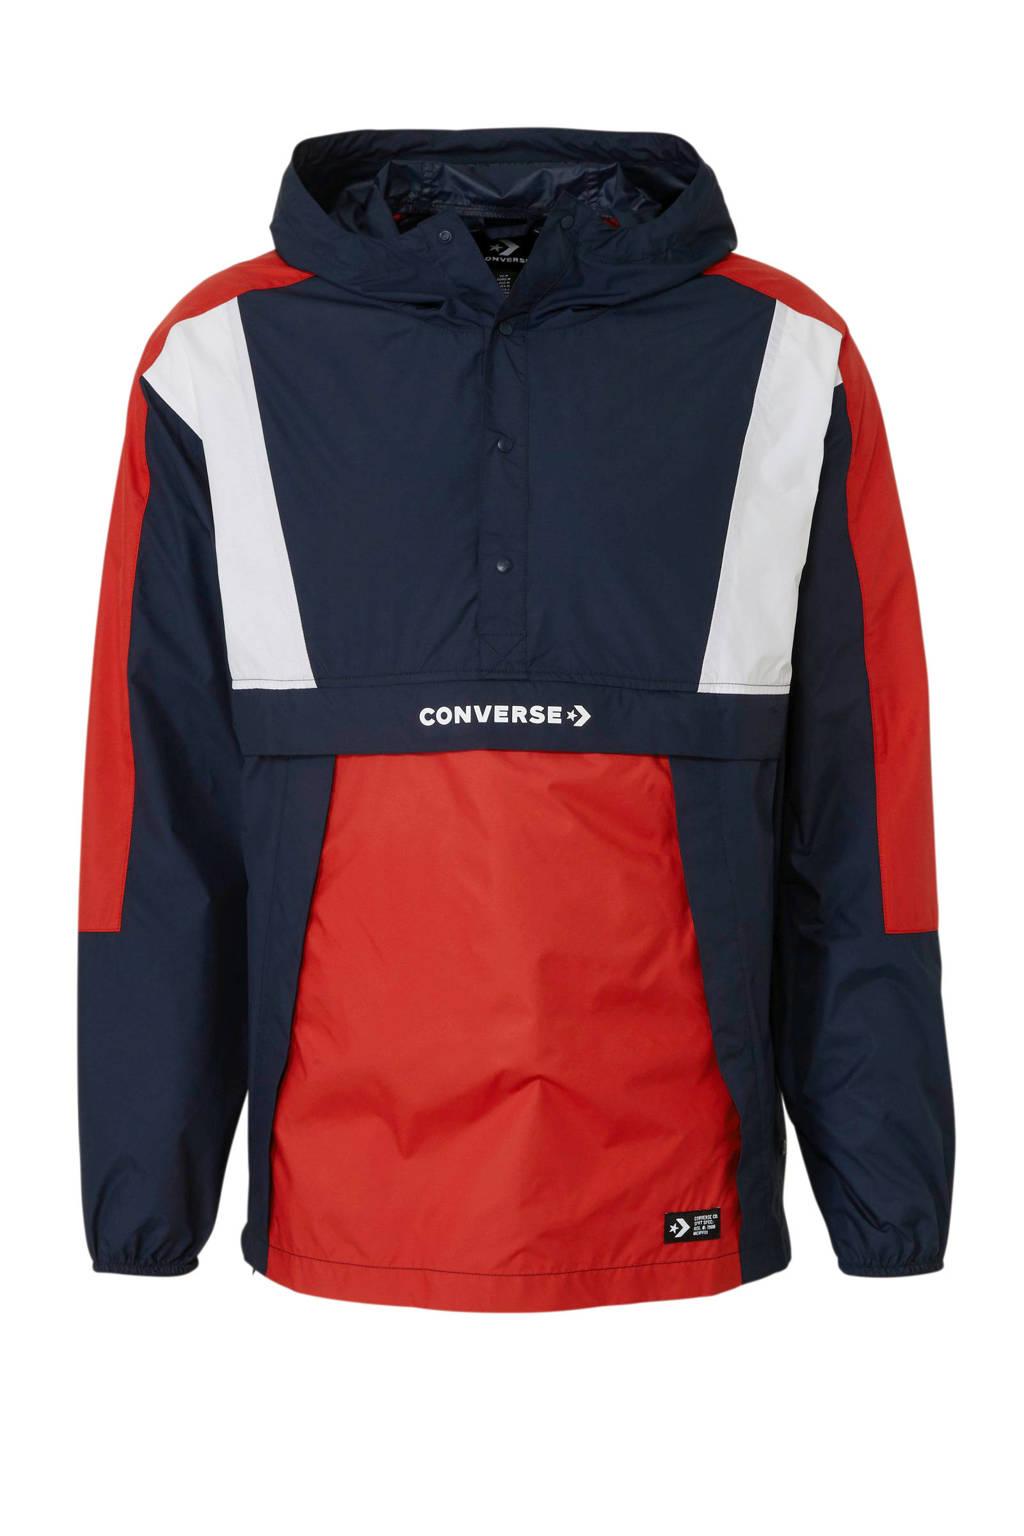 Converse anorak donkerblauw, Donkerblauw/rood/wit